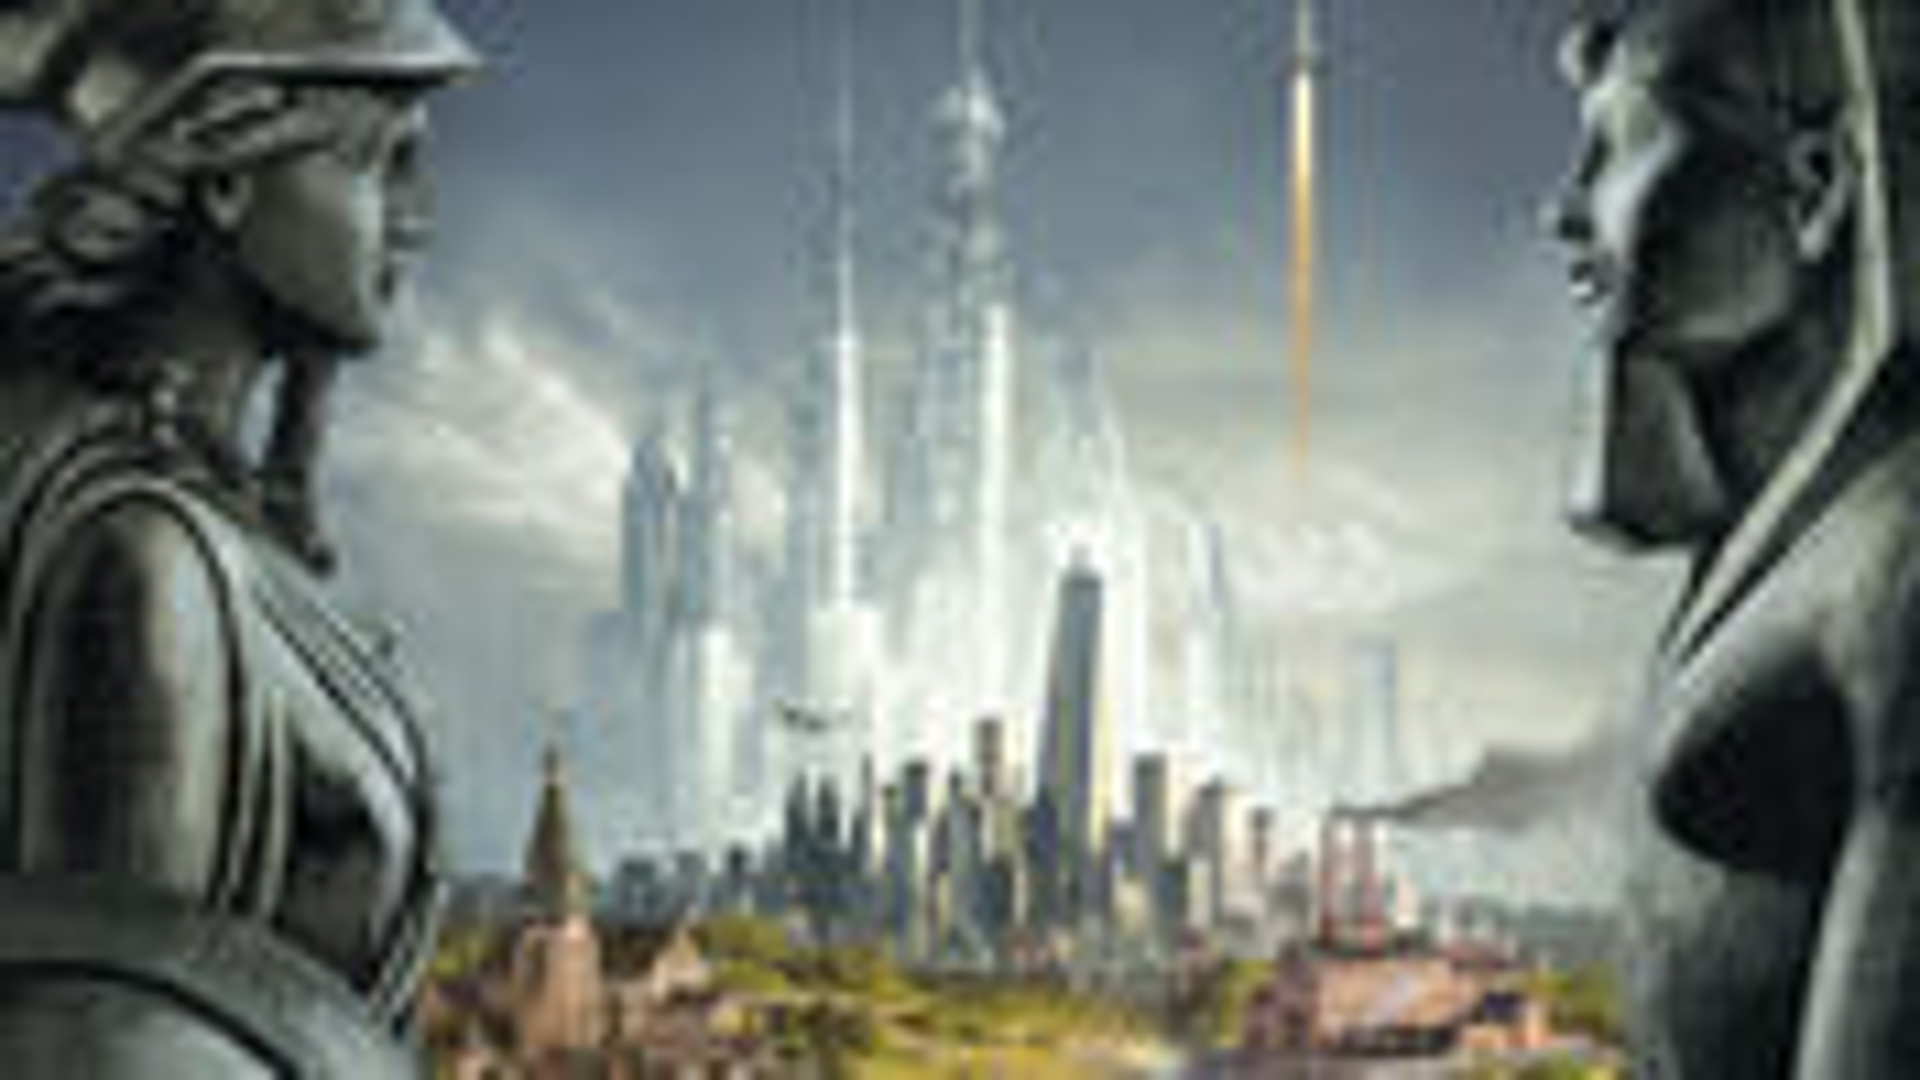 Sid Meier's Civilisation: A New Dawn board game artwork